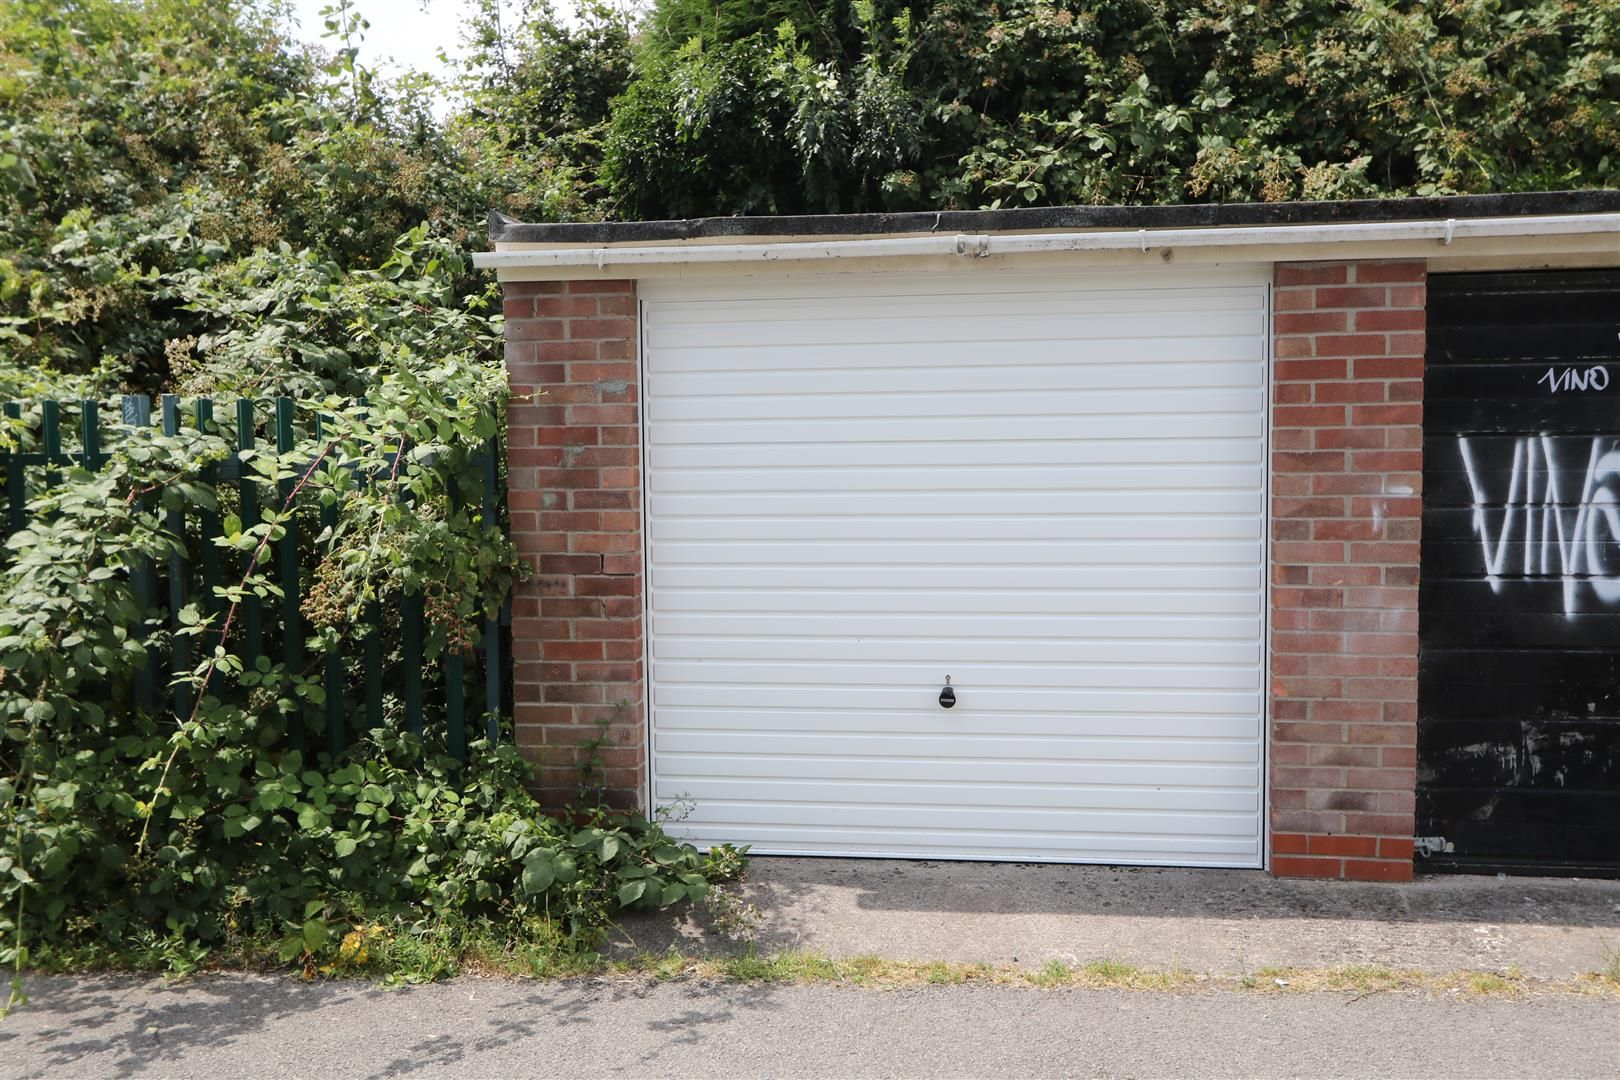 Property photo 1 of 3. Img_5451.Jpg